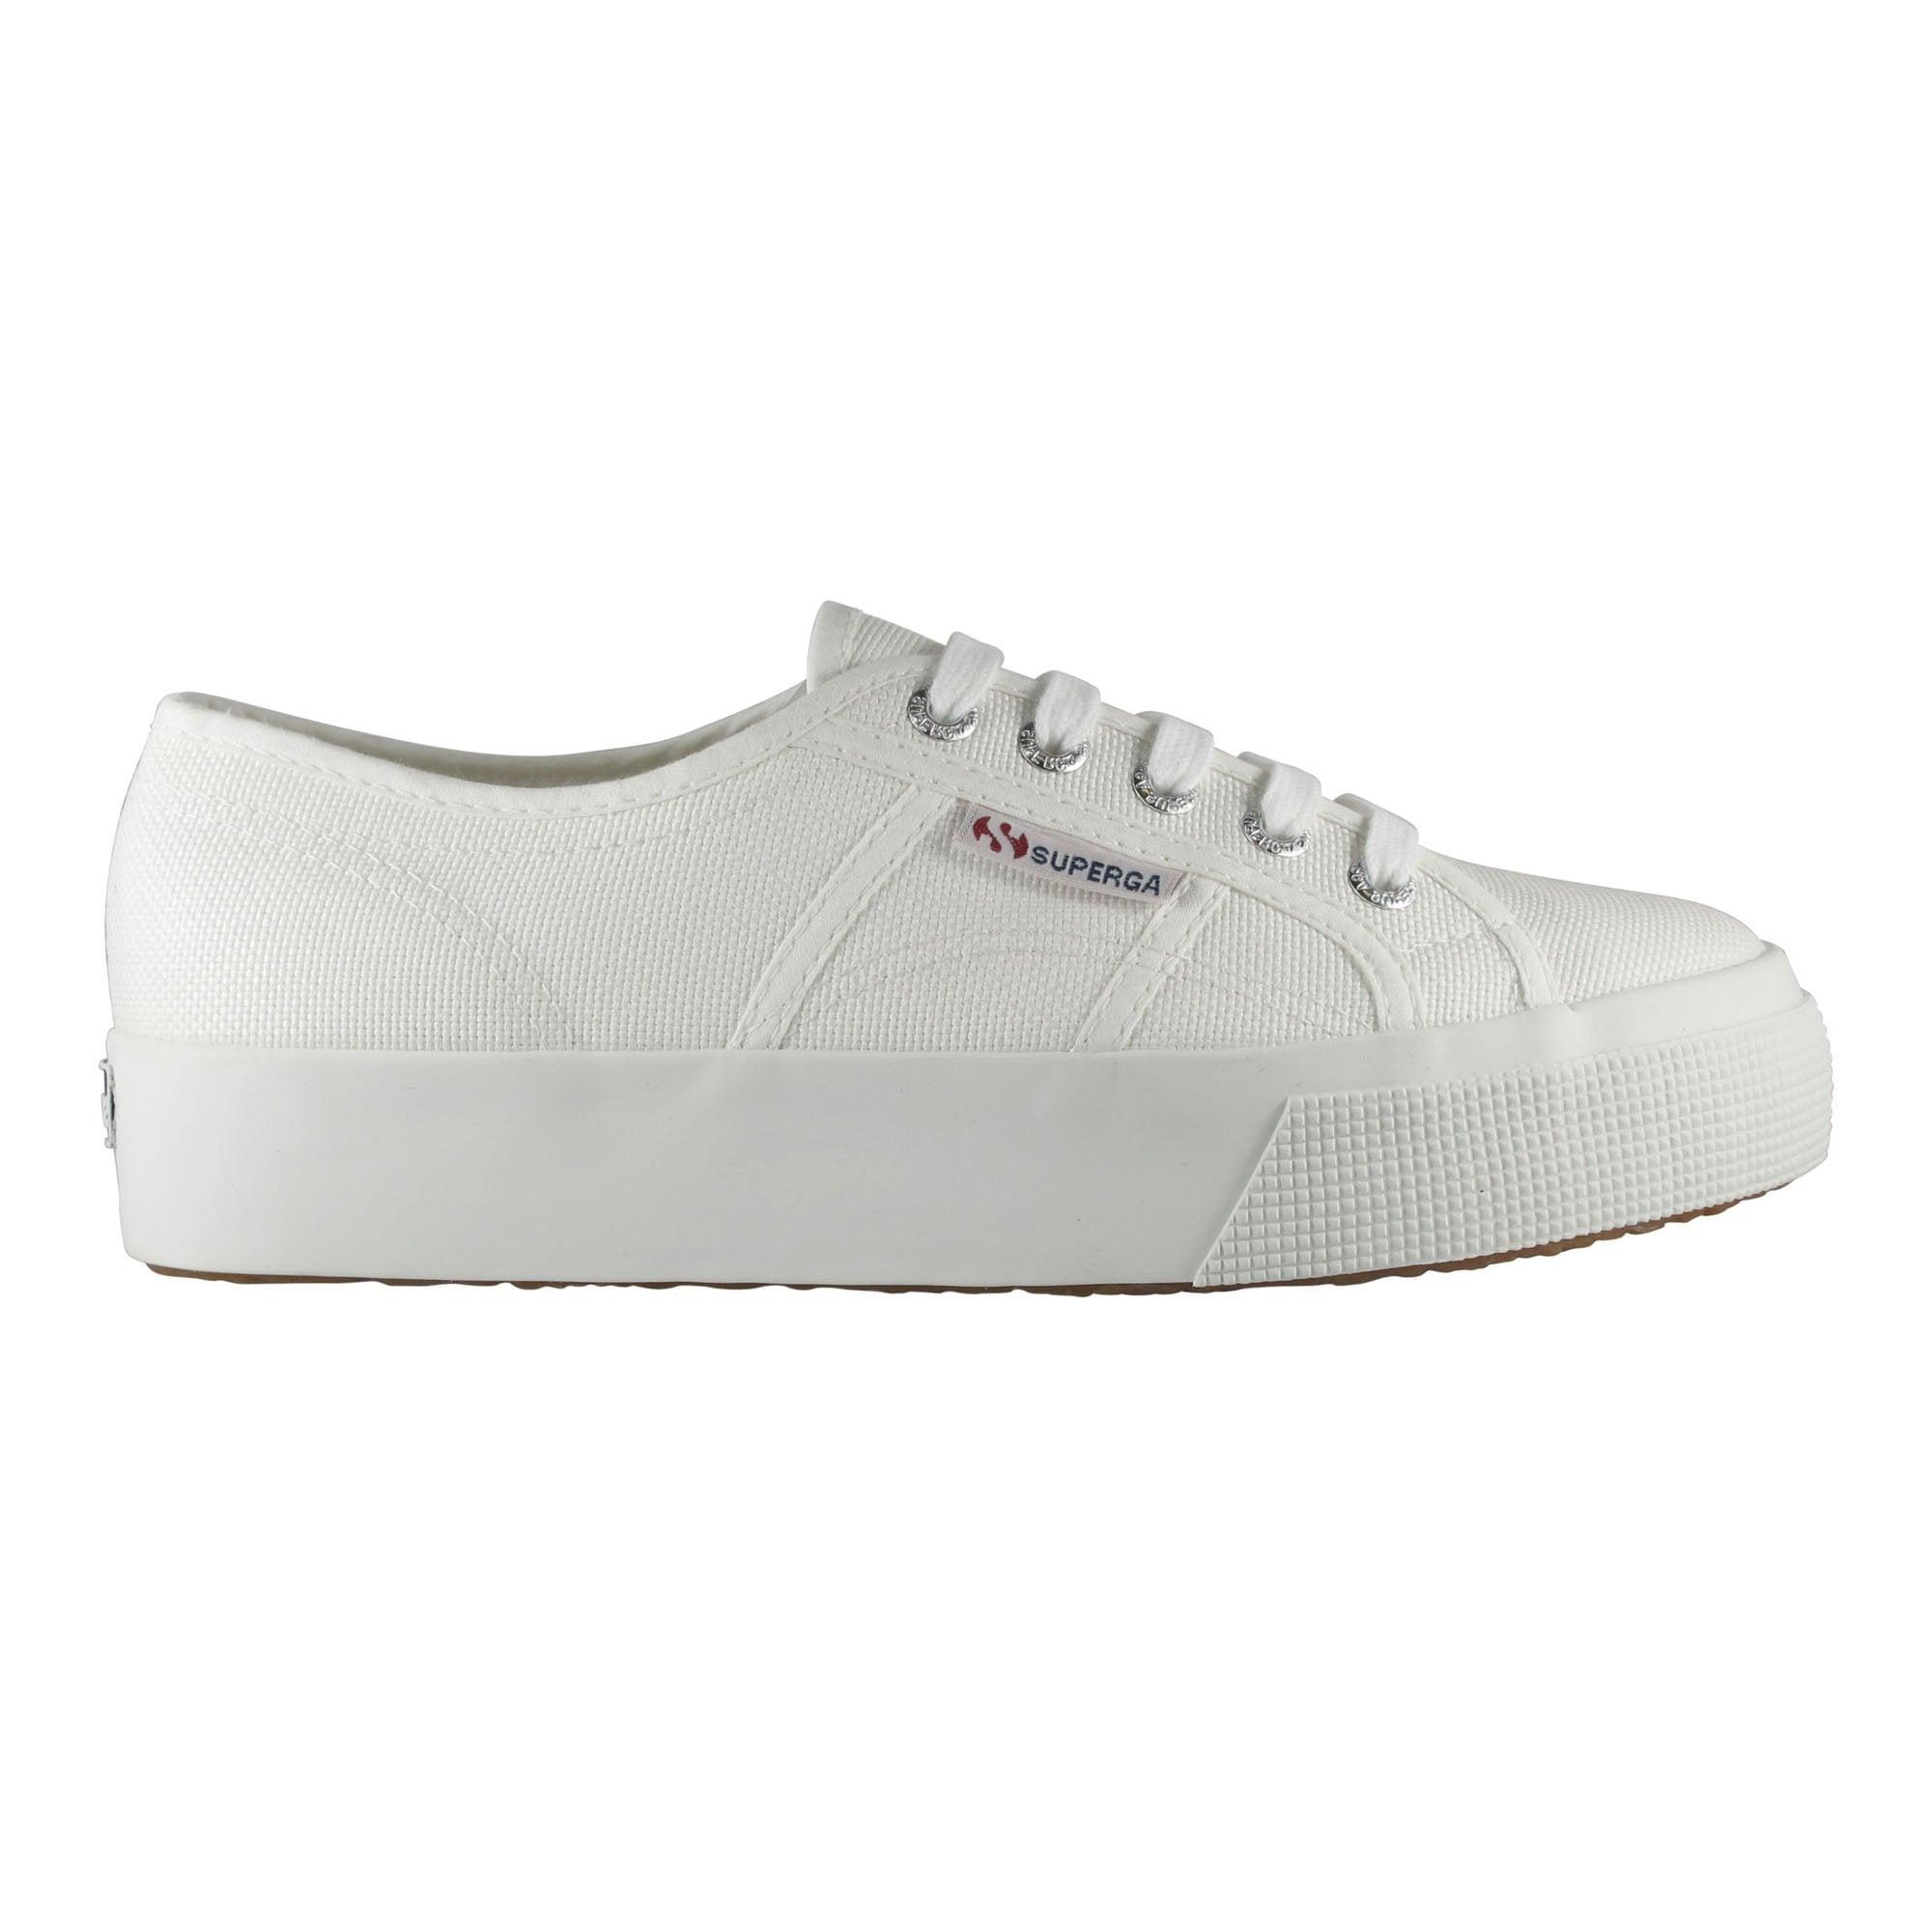 52a2d1476a 2730 Cotu Mid Platform Sneaker in White | Collen & Clare